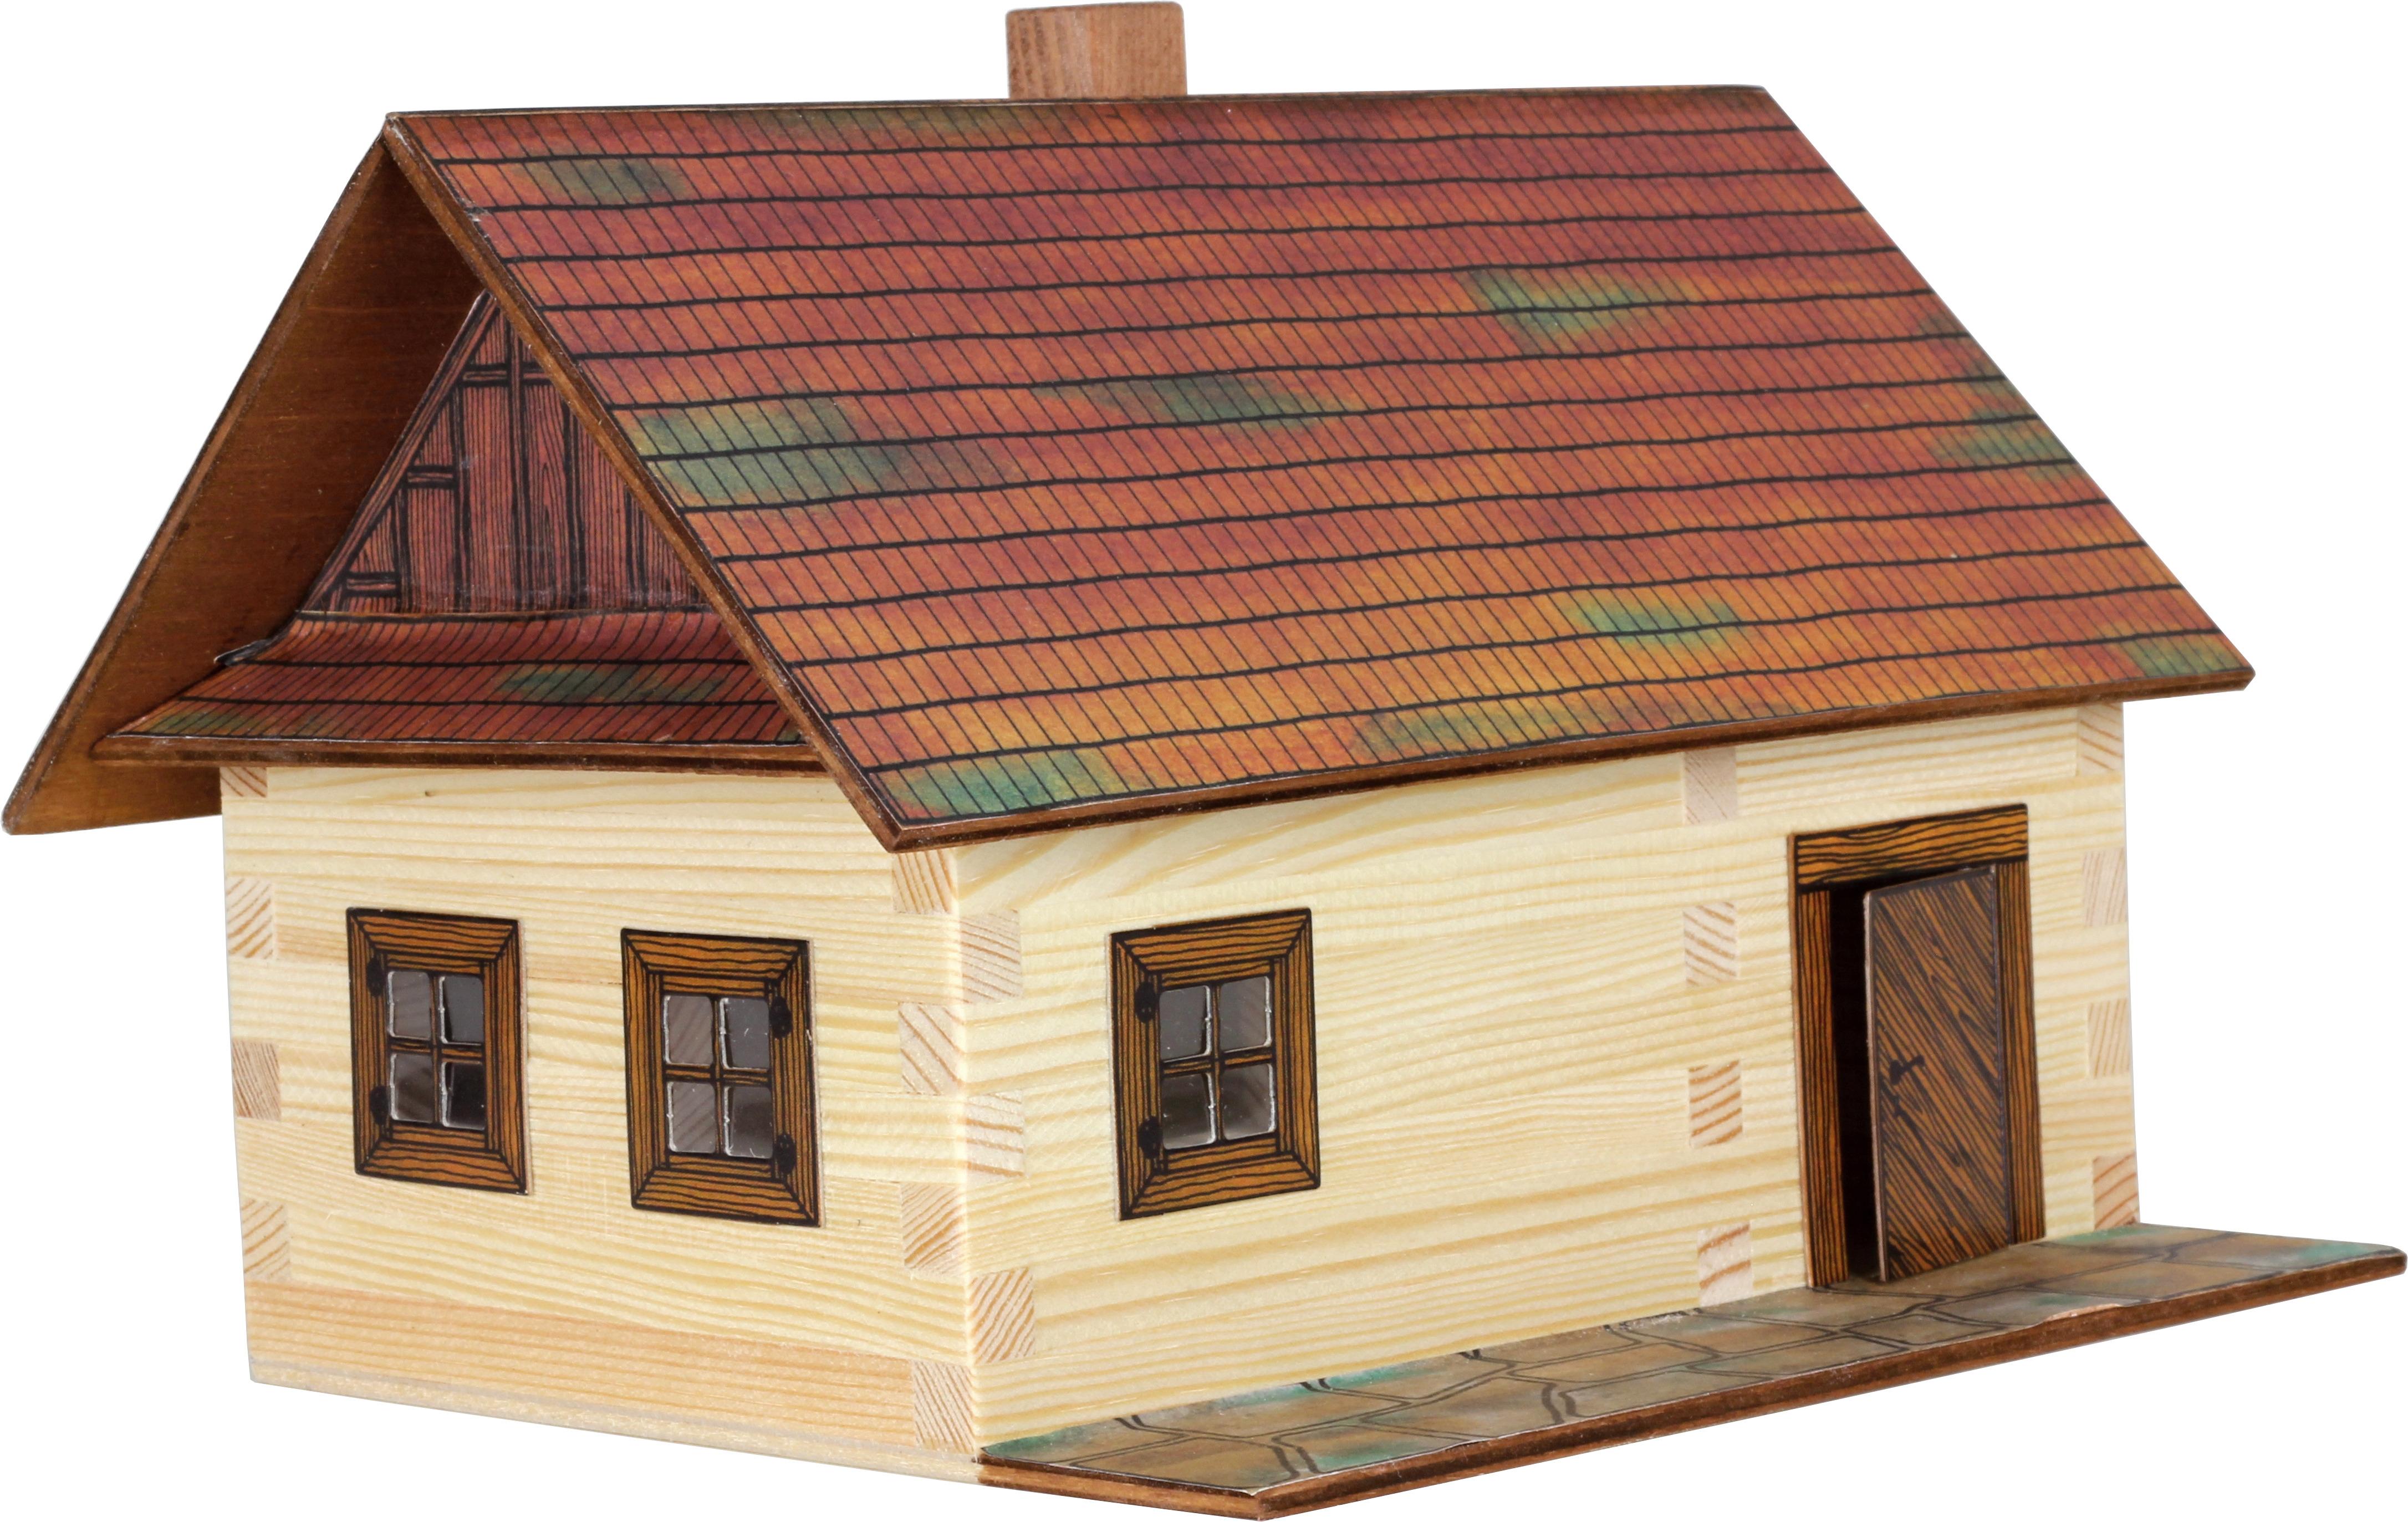 Cabana de lemn - joc educativ de construit Walachia 0